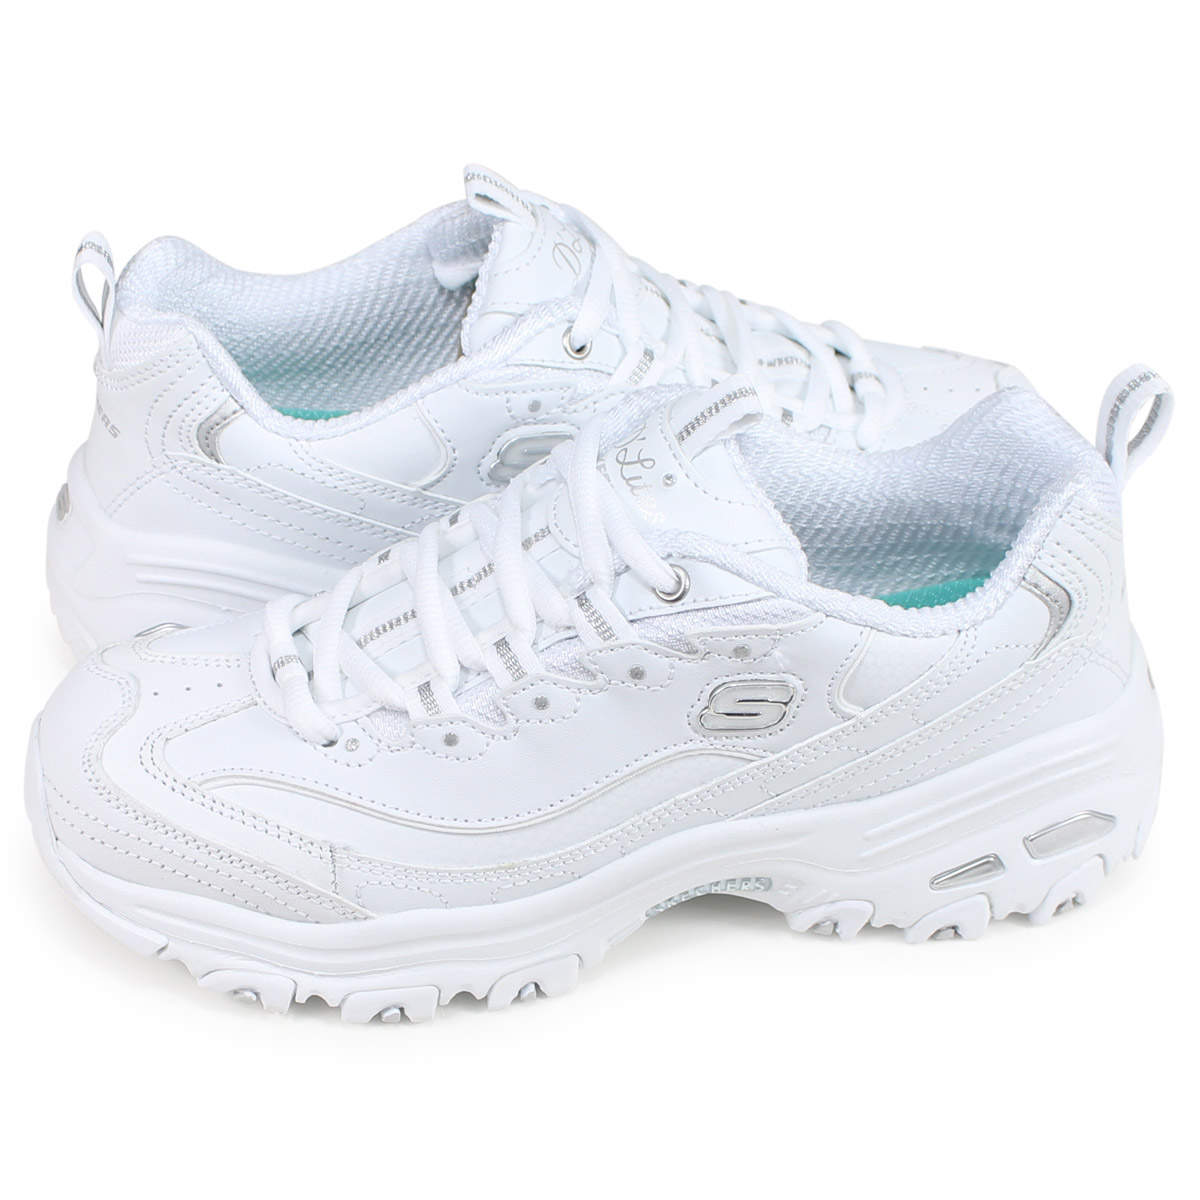 Sneakers Women's Shoes Shoes Sketchers 22.5